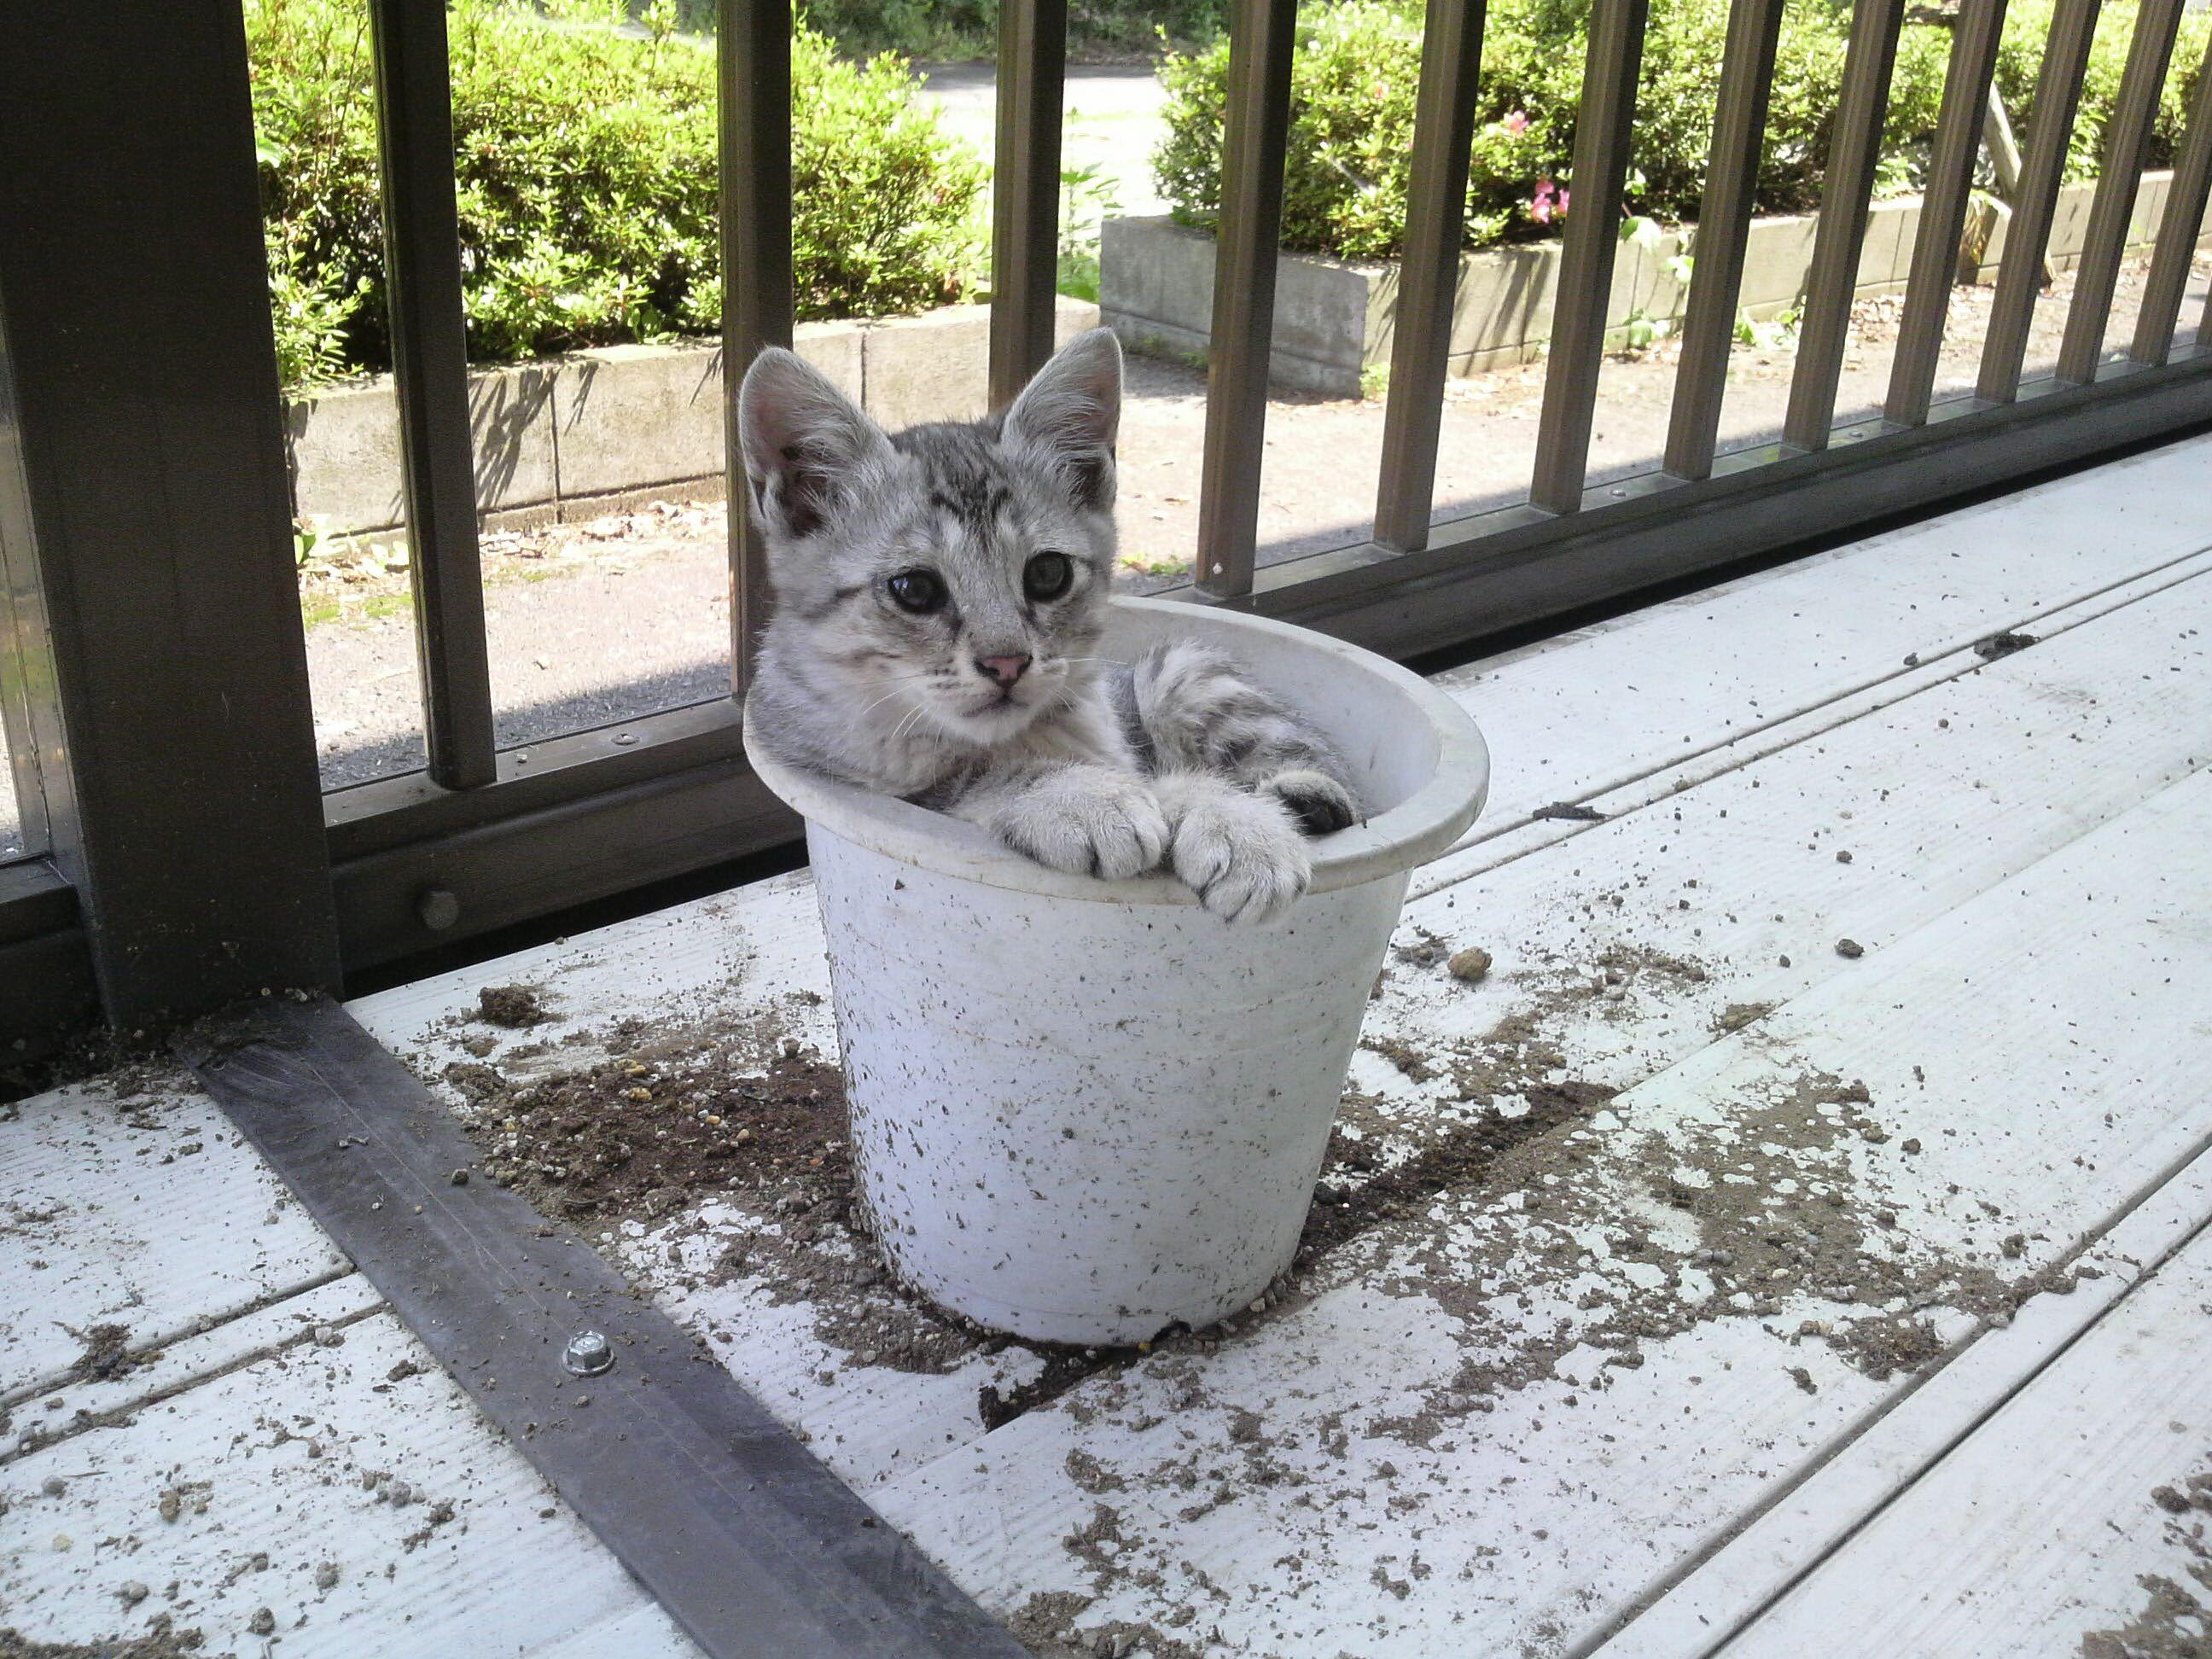 Cat in the flower pot.